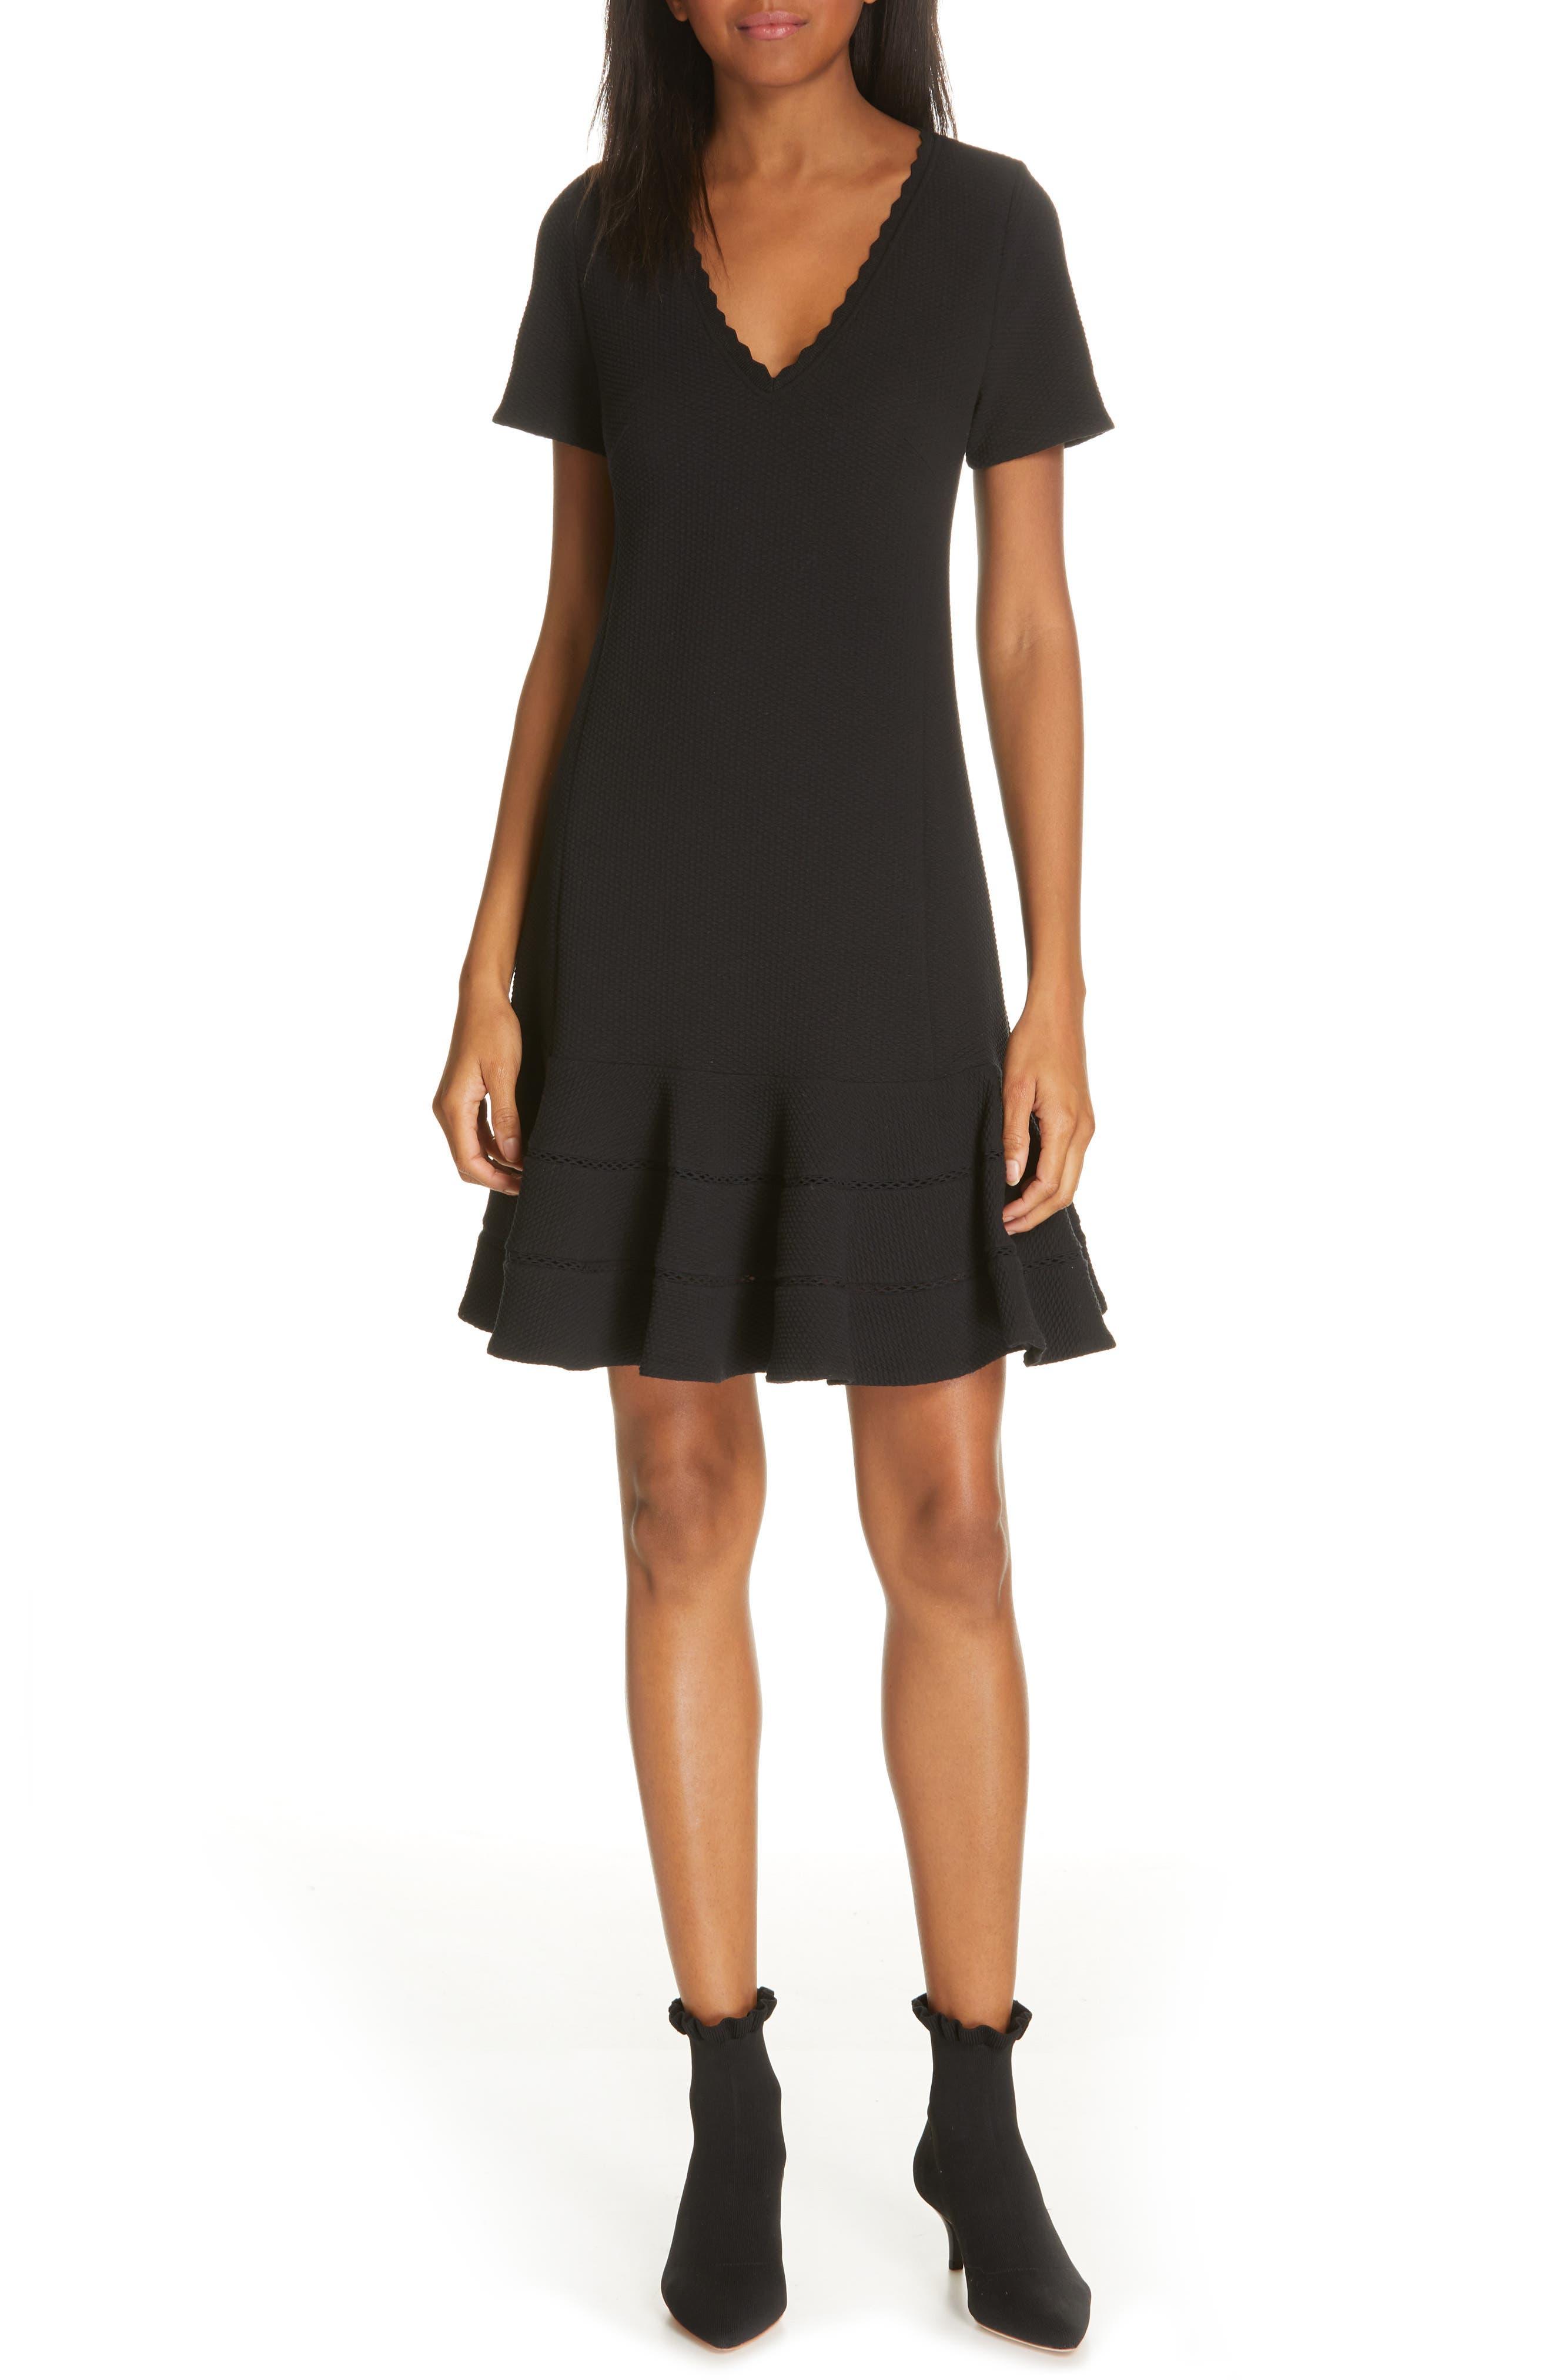 REBECCA TAYLOR Fit & Flare Dress, Main, color, BLACK